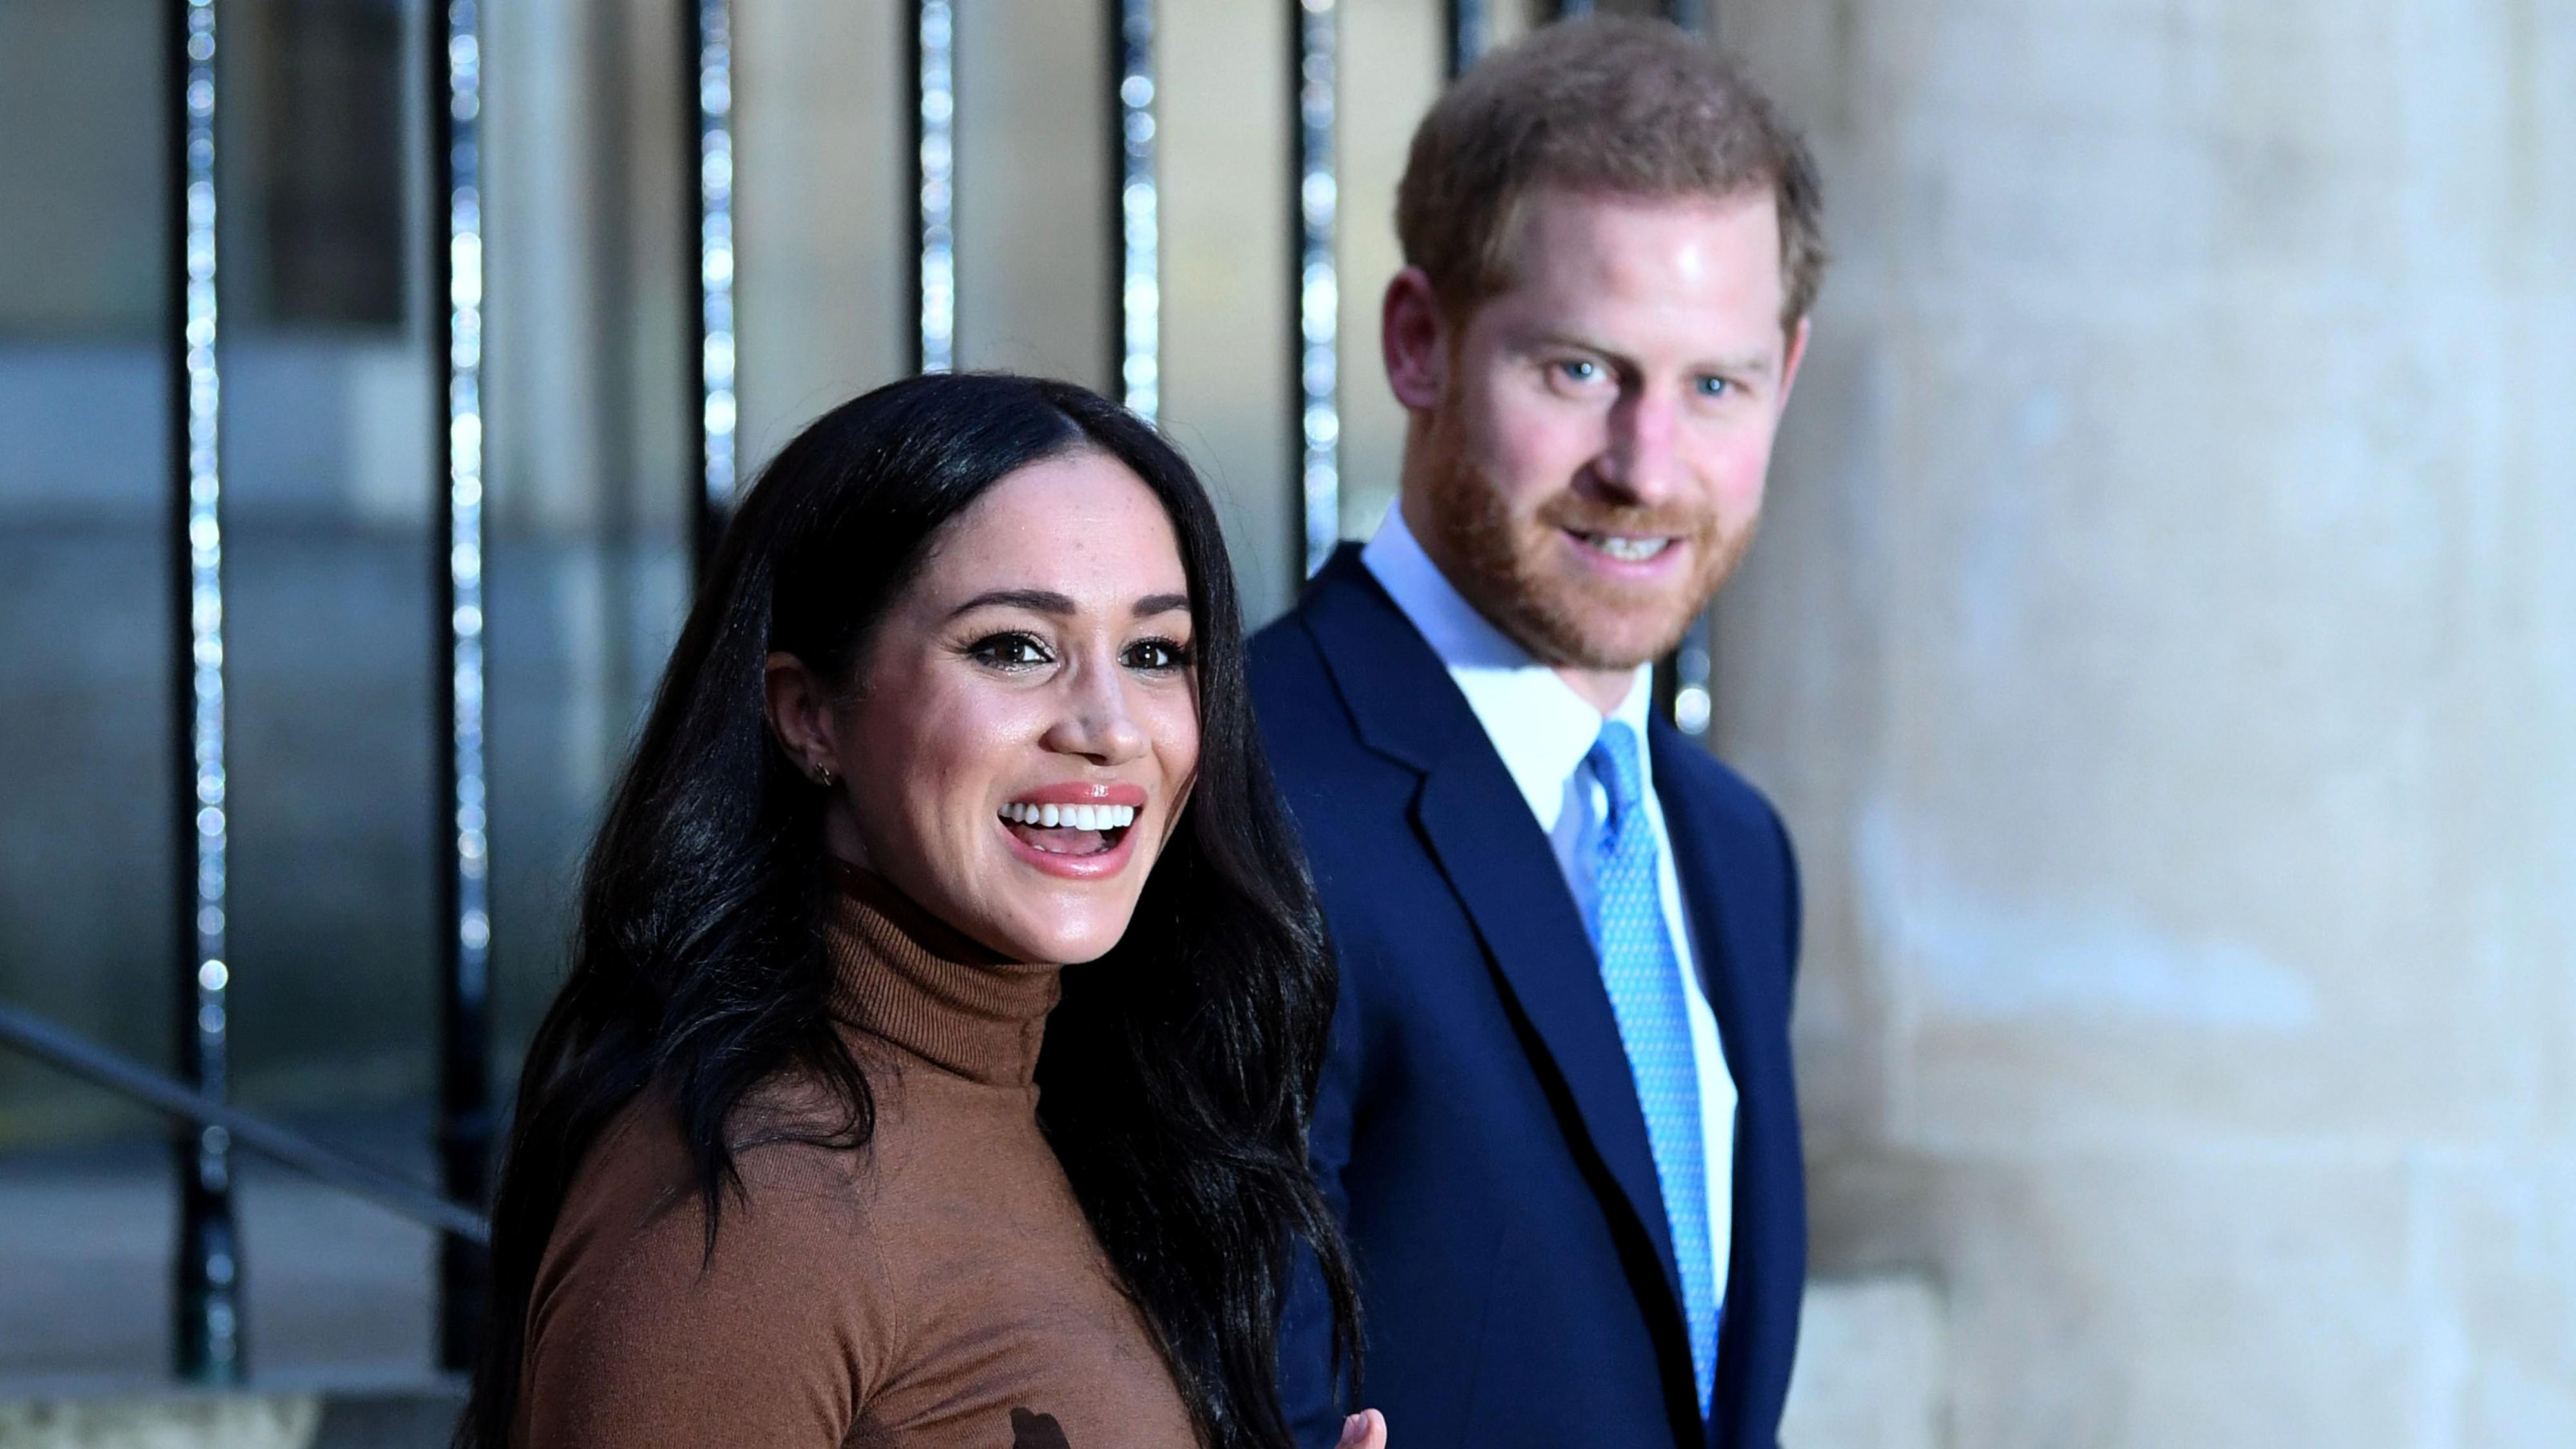 Queen-Biografin sicher: Meghan bereut ihre Entscheidung